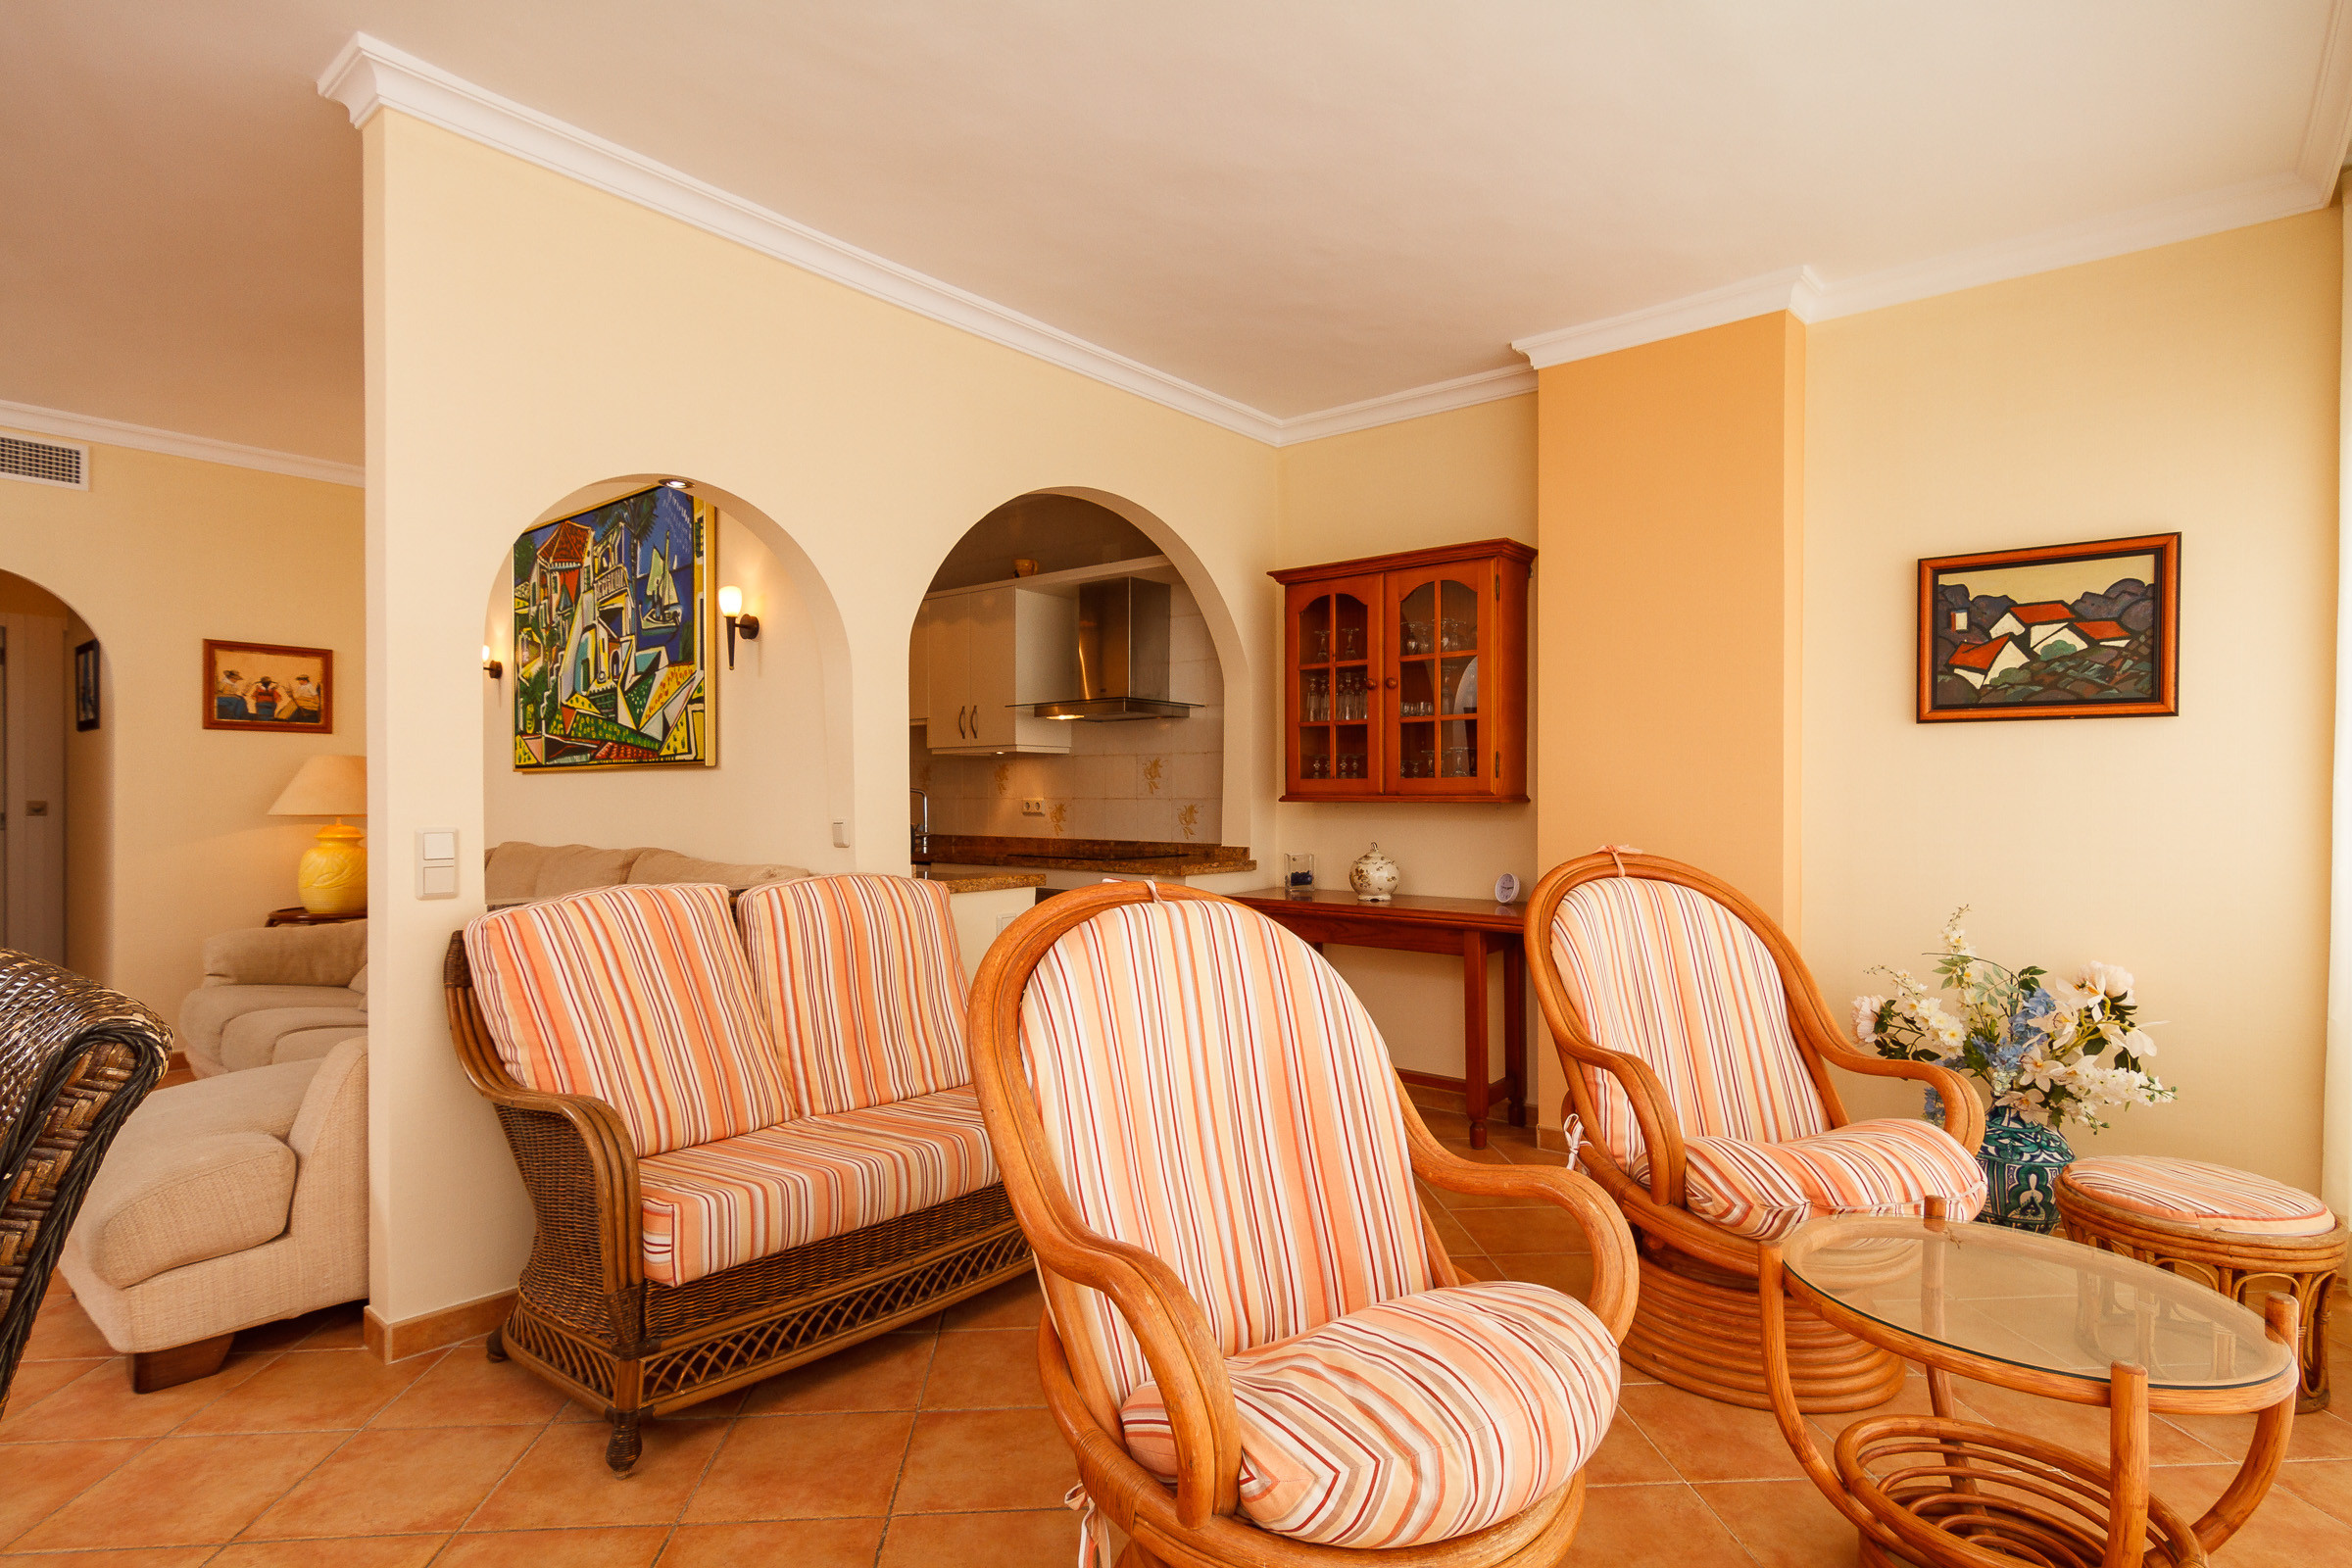 Edificio Carabeo Nerja - Apartments for rent (ES)